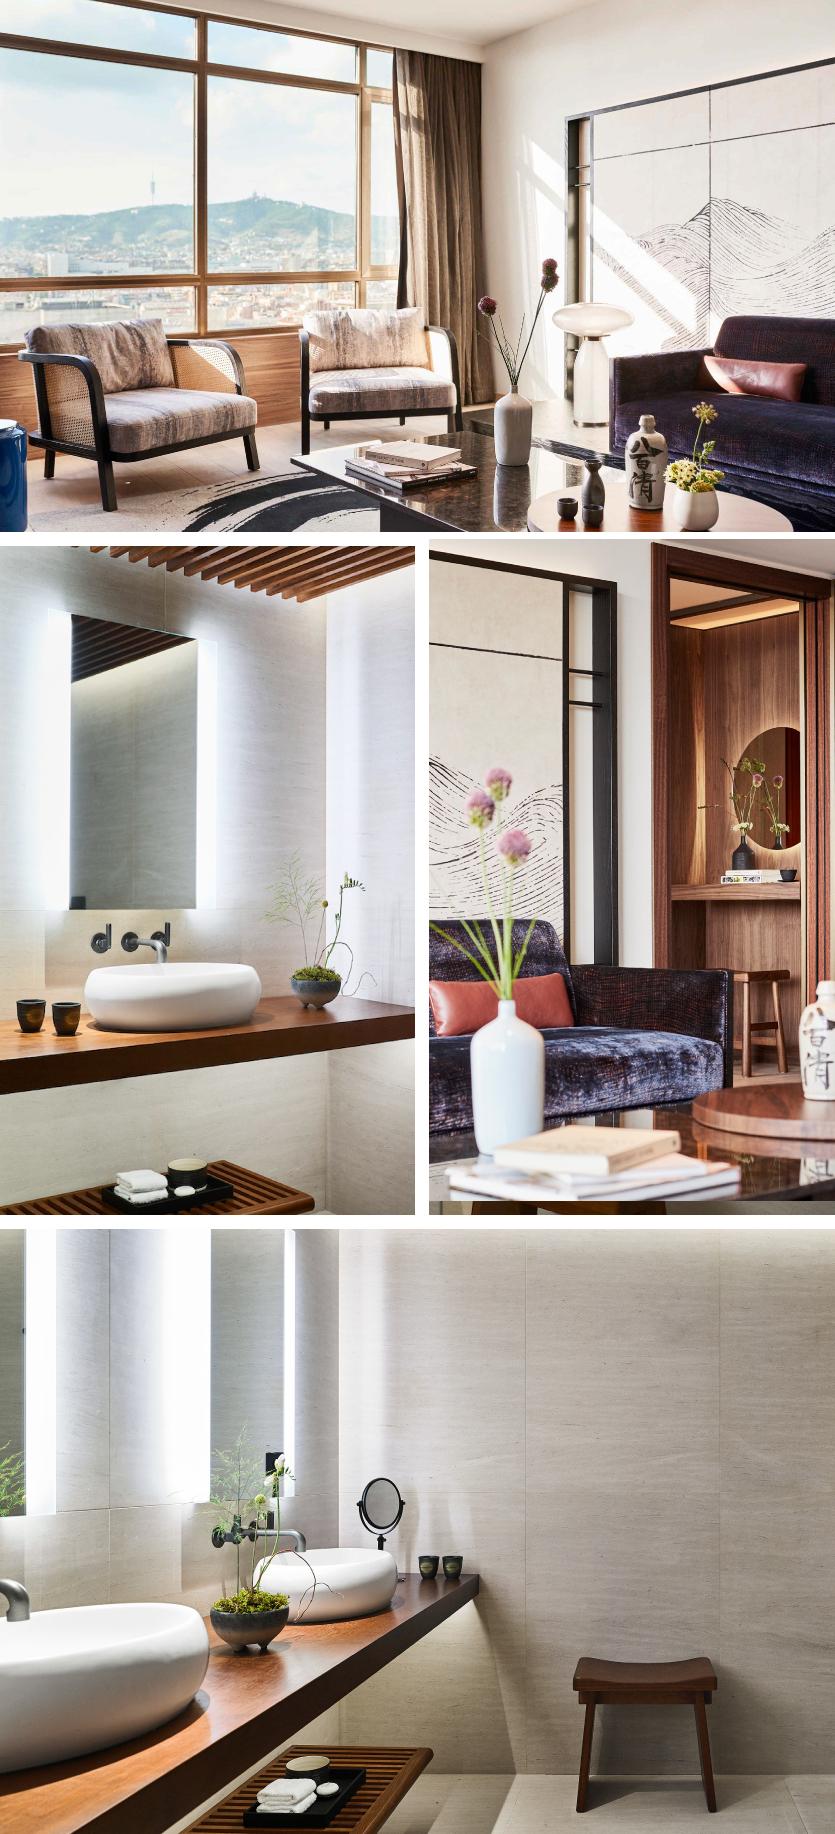 Nobu-Barcelona-Hotel-apaiser-Lotus-Basin-2